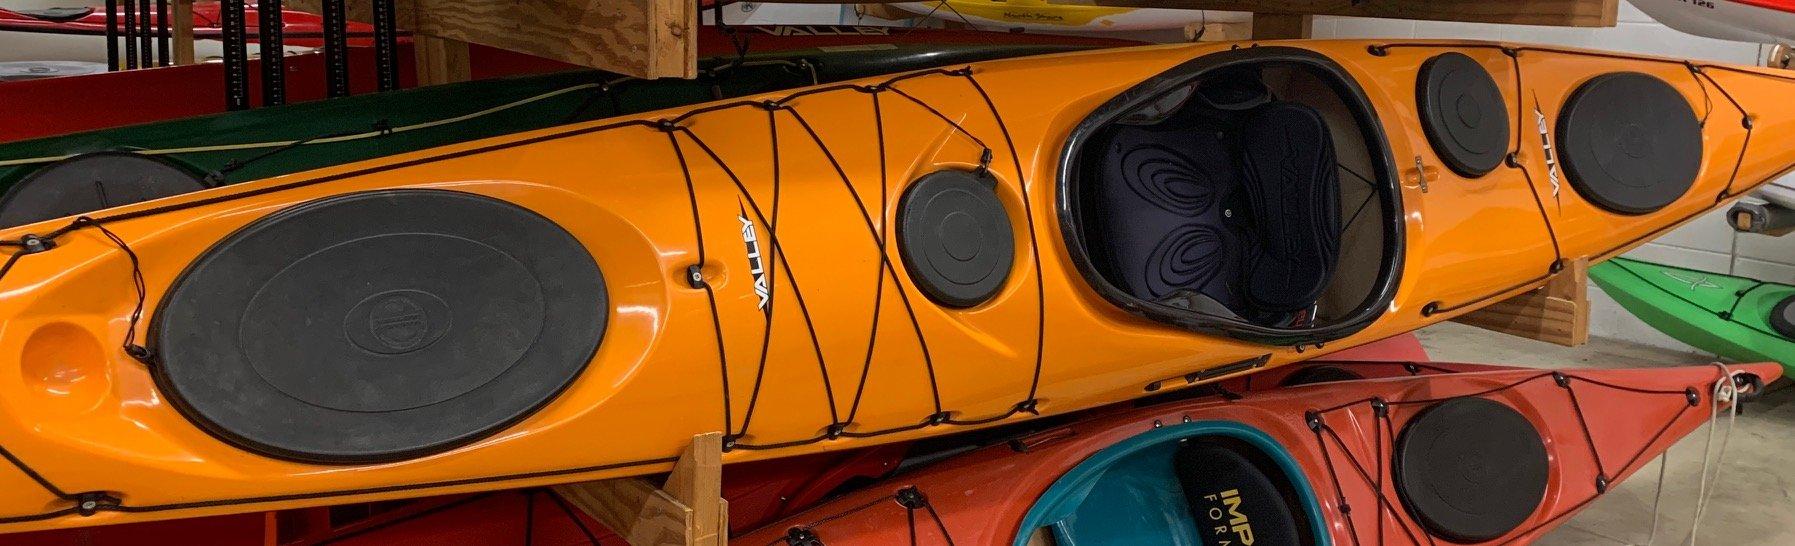 Valley Sea Kayak Etain 17.7 Demo